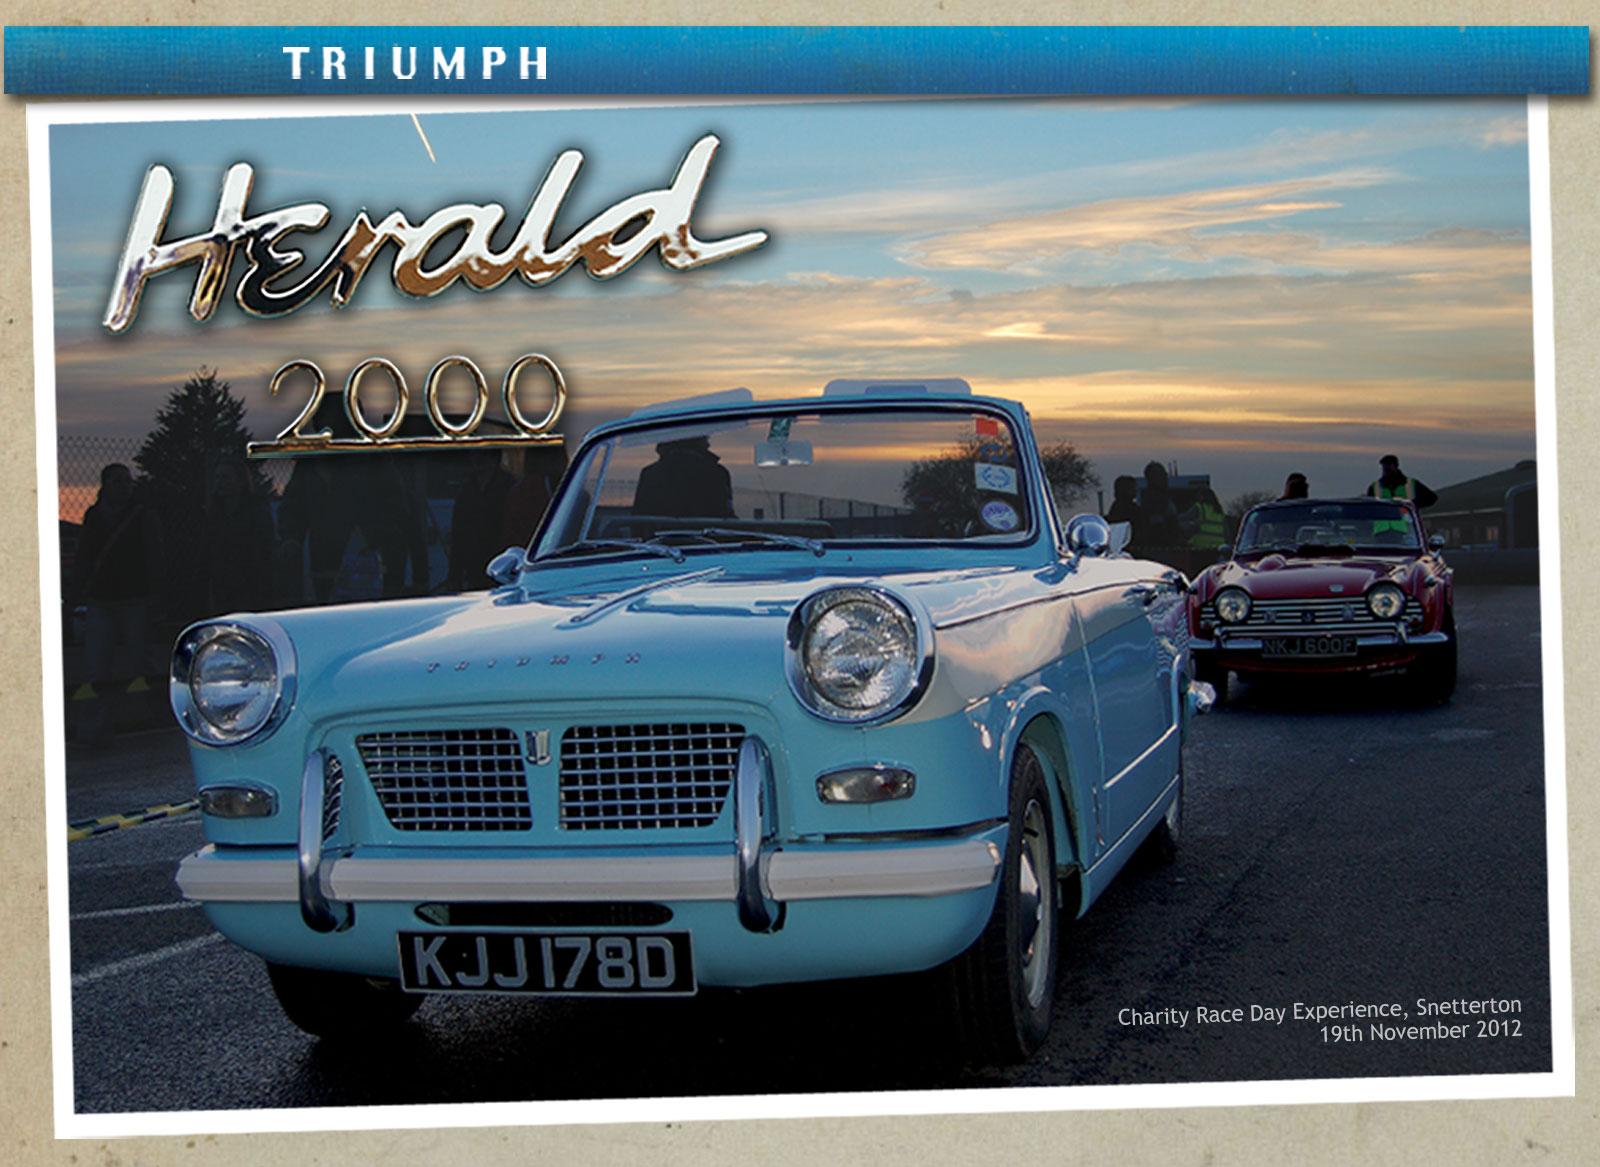 Triumph Herald 2000 and Viking Fibreline Caravan